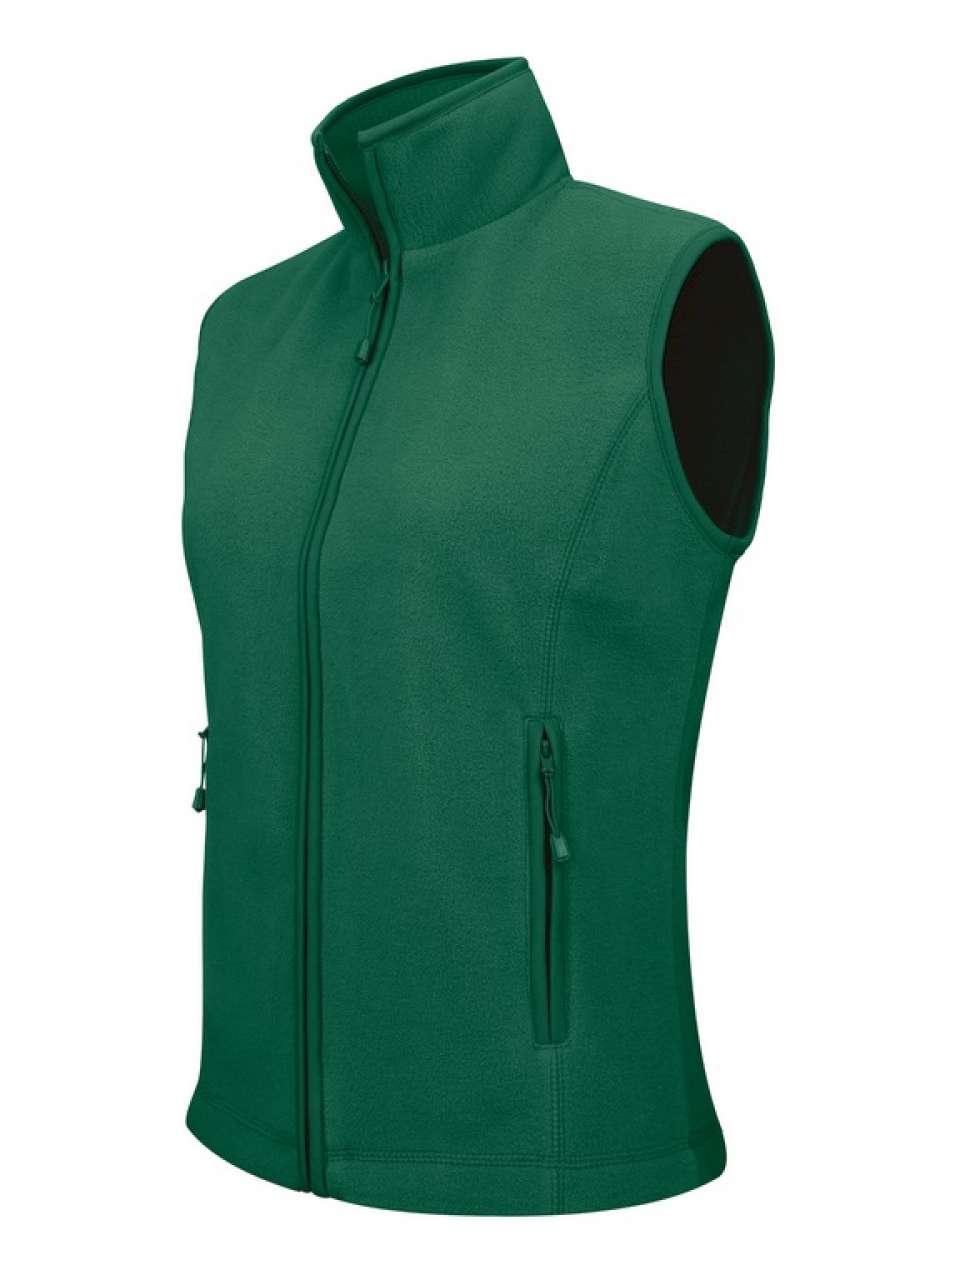 Vesta KA906 verde inchis forest Veste jachete dama barbatesti polar fleece softshell fas gluga ploaie vant broderie serigrafie termotransfer | Toroadv.ro